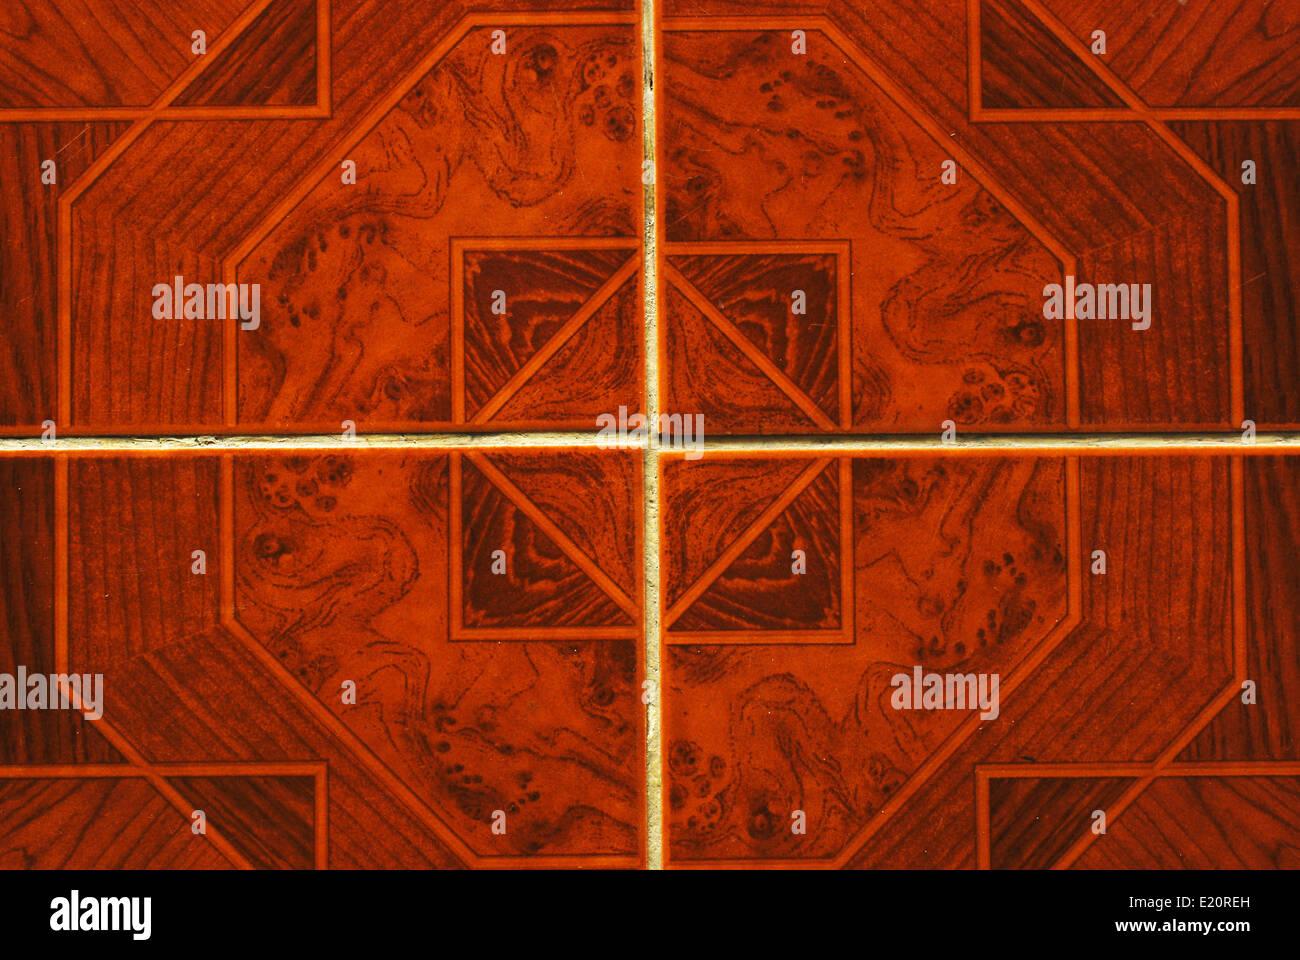 Abtract Fantasy design - Stock Image